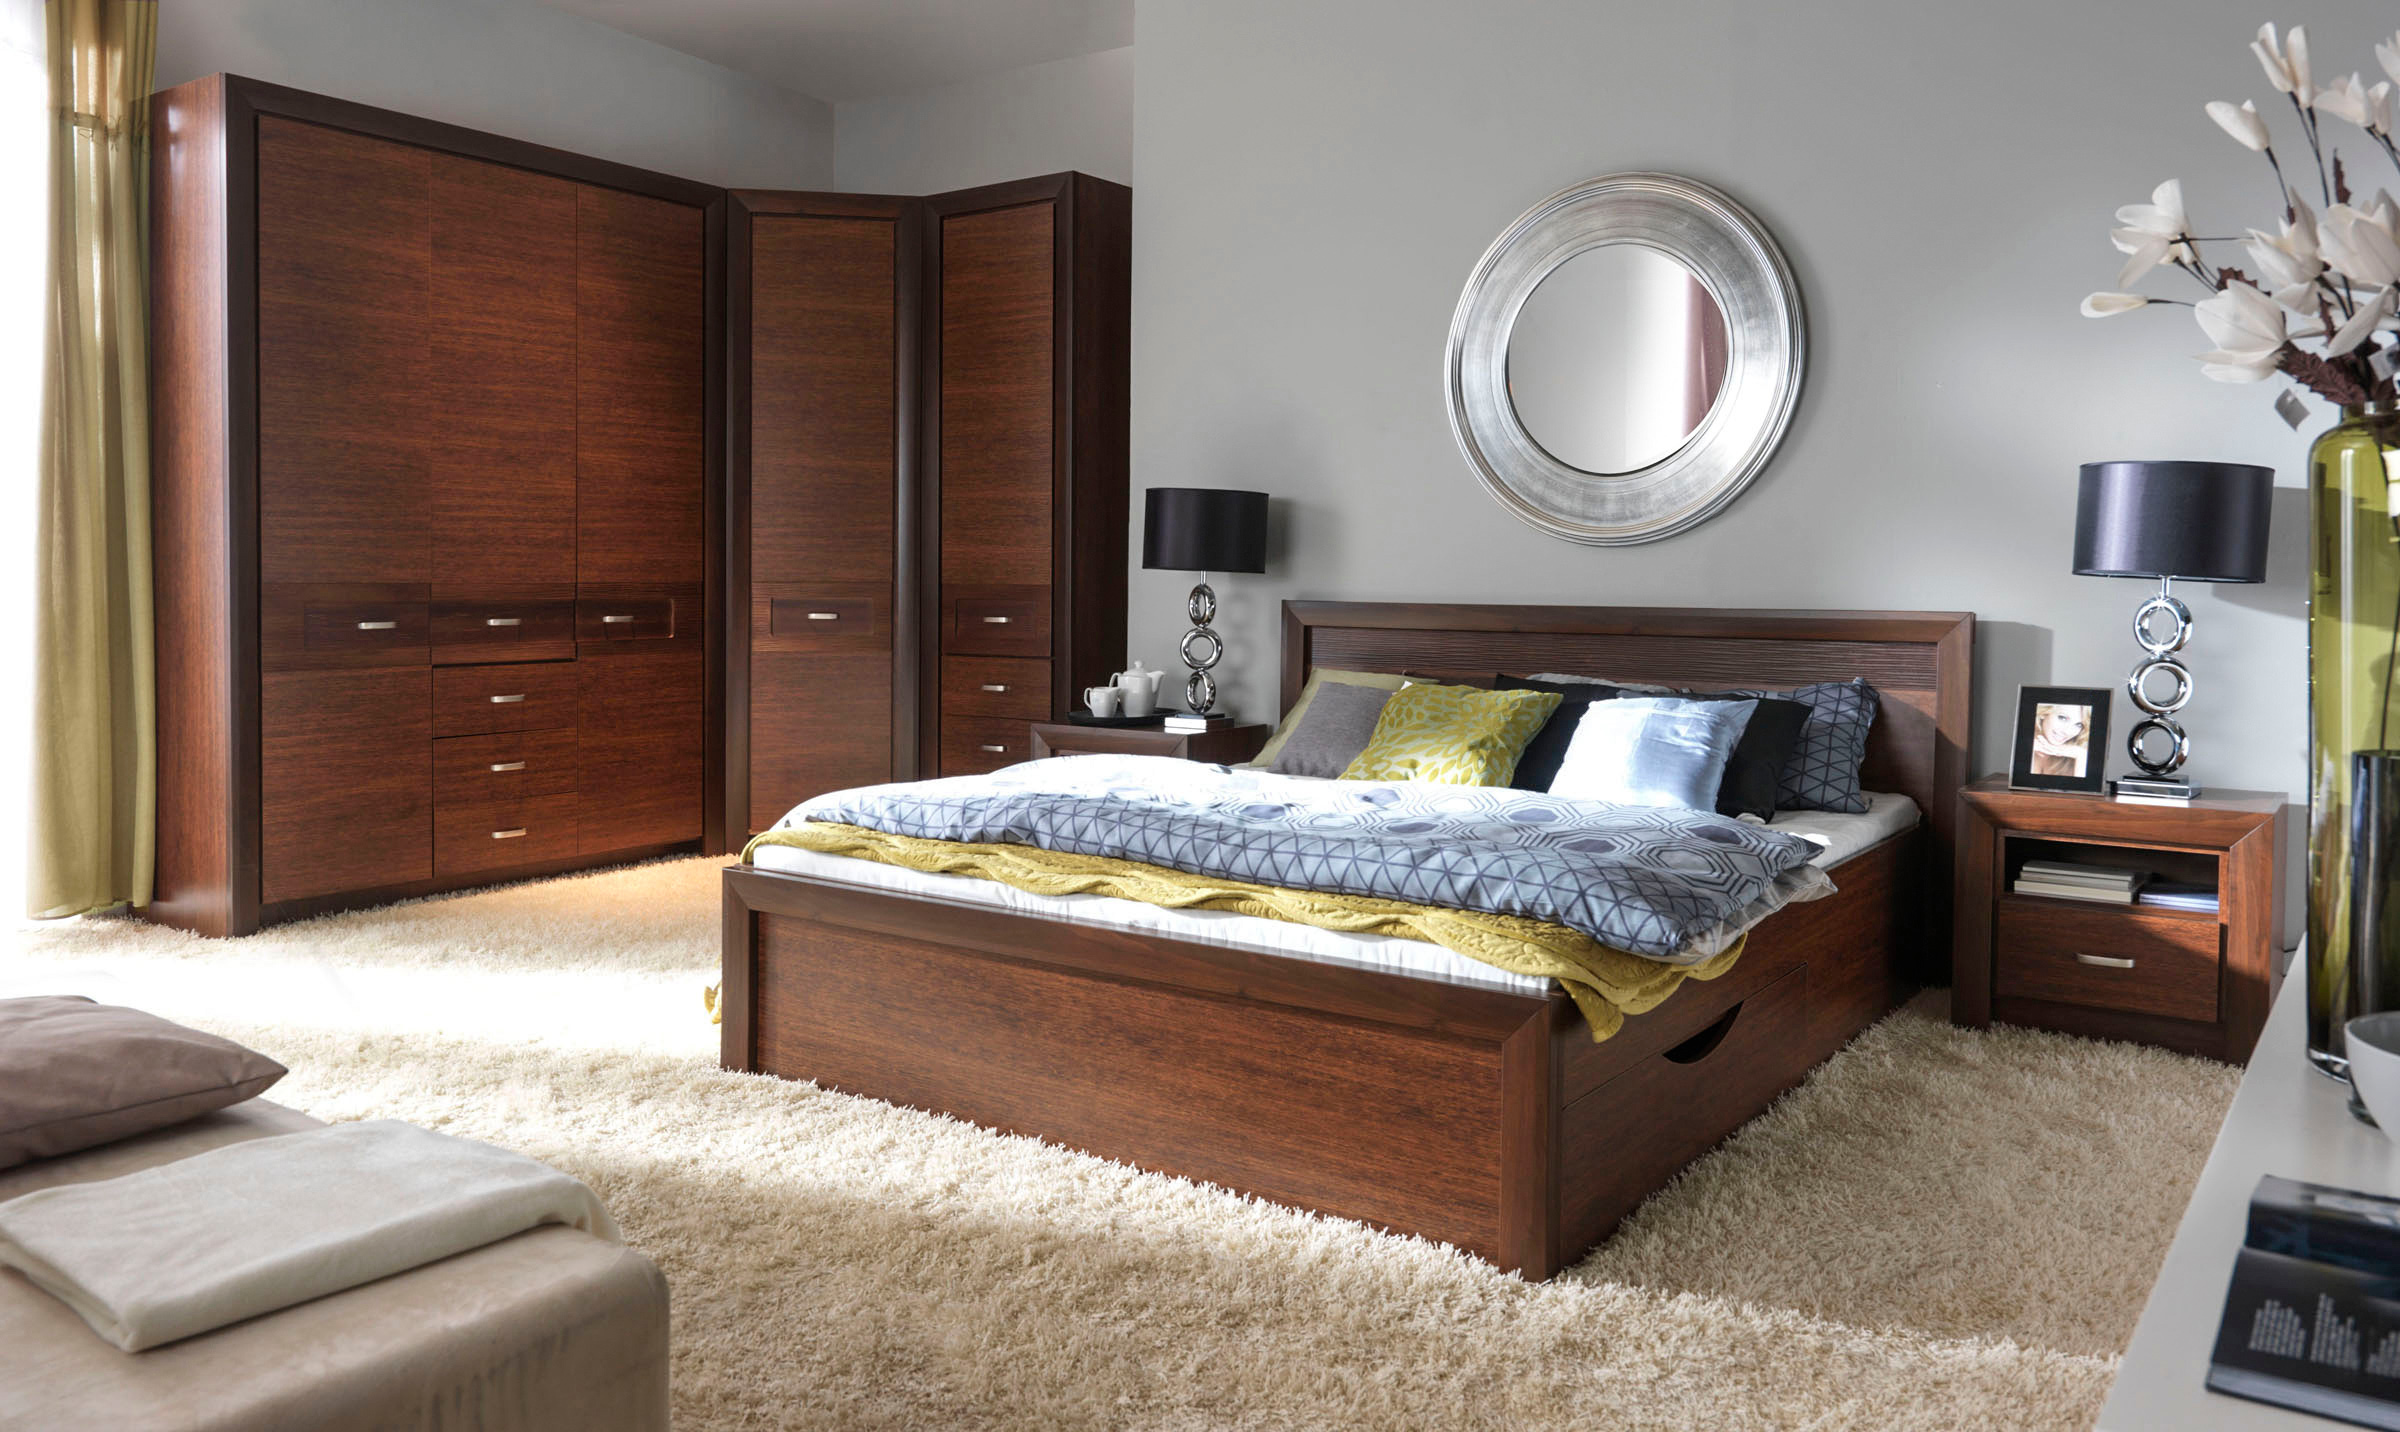 Sypialnia agata meble